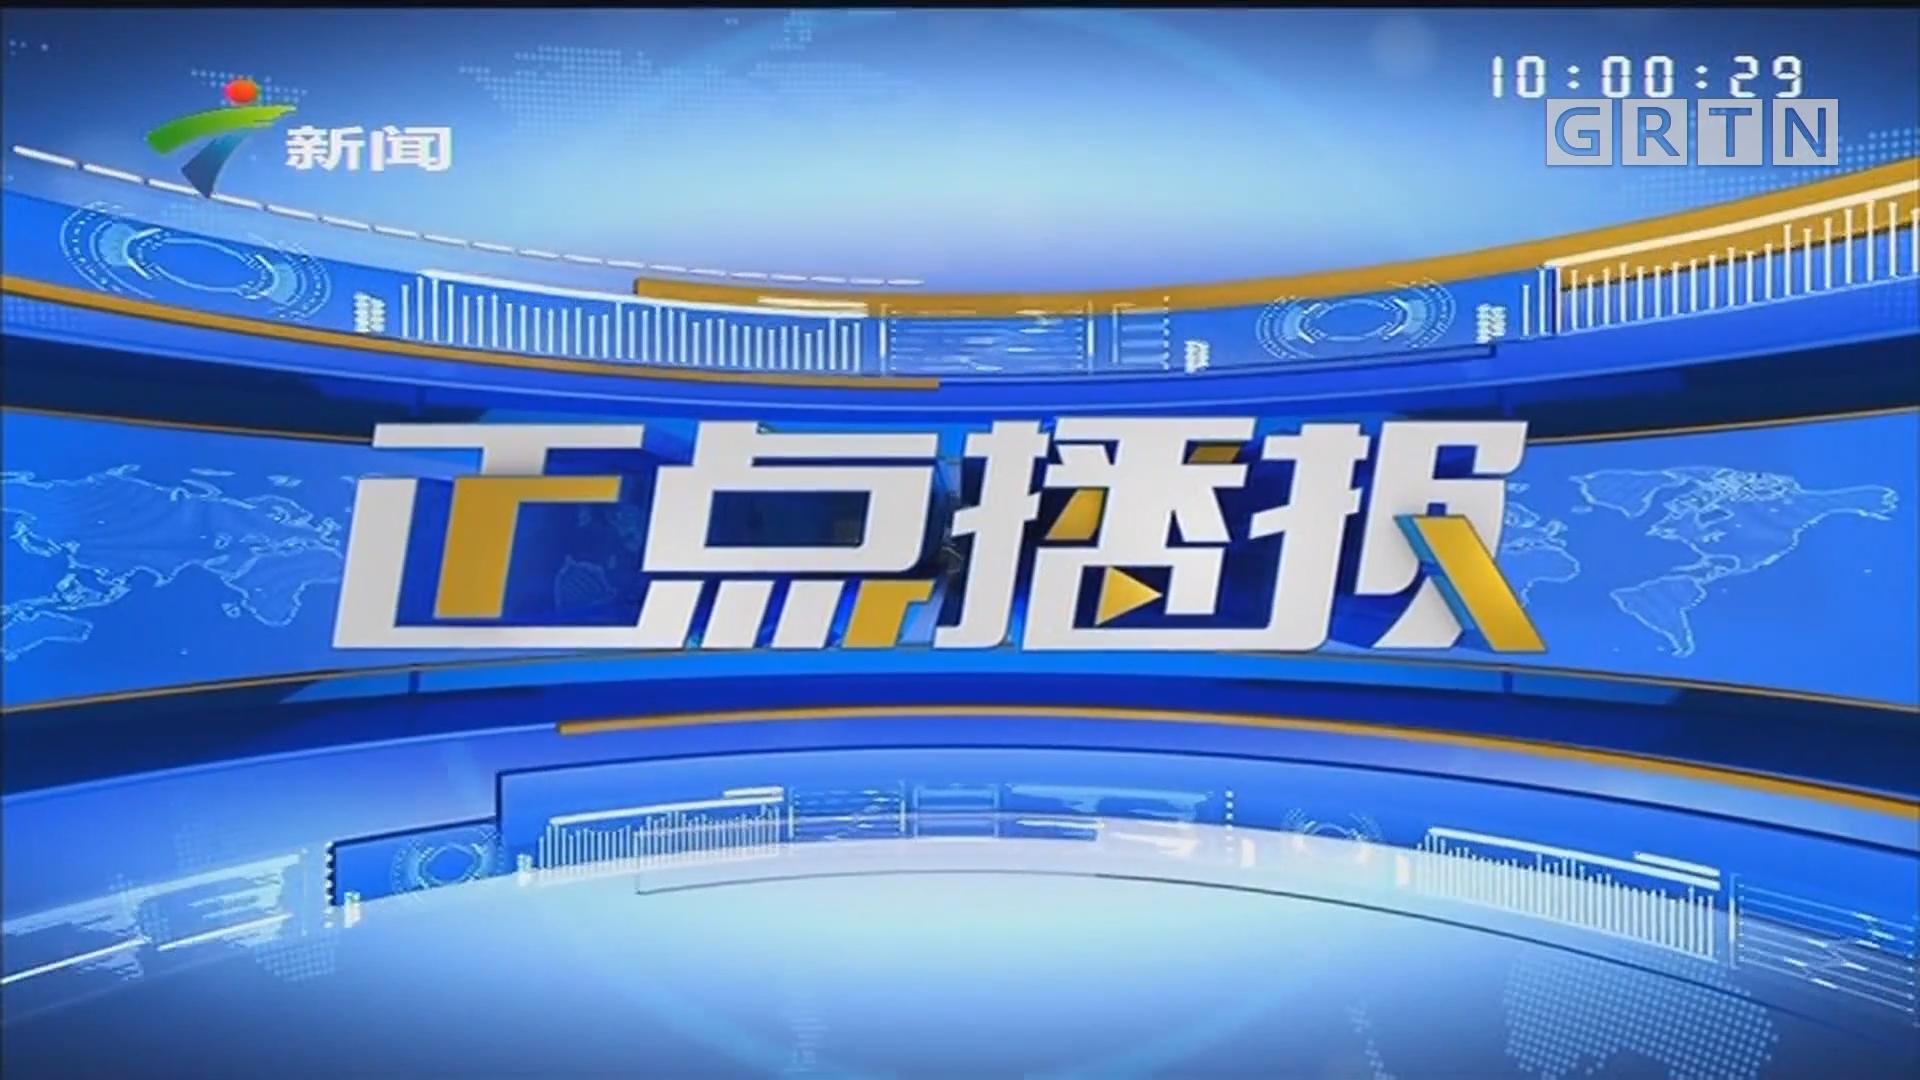 [HD][2019-09-28]正点播报:南粤大地喜迎国庆巡礼:广州焰火晚会地点敲定 实行预约抽签进场